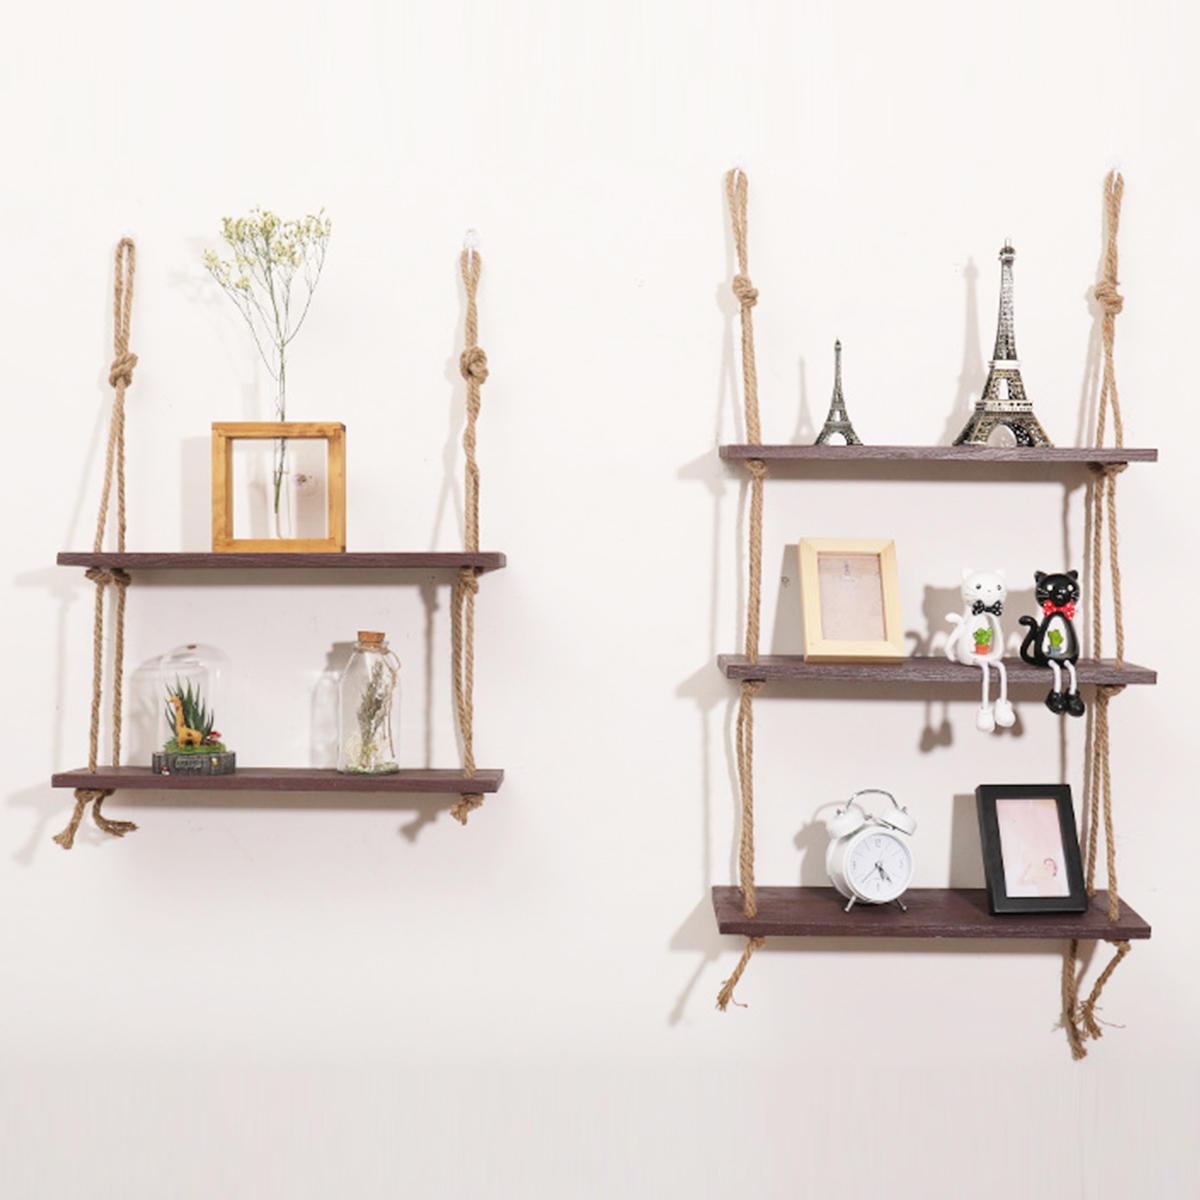 3 Tier Wood Wall Mount Shelf Stand Storage Book Shelves Display Rack Shelving Bracket Bathroom pertaining to proportions 1200 X 1200